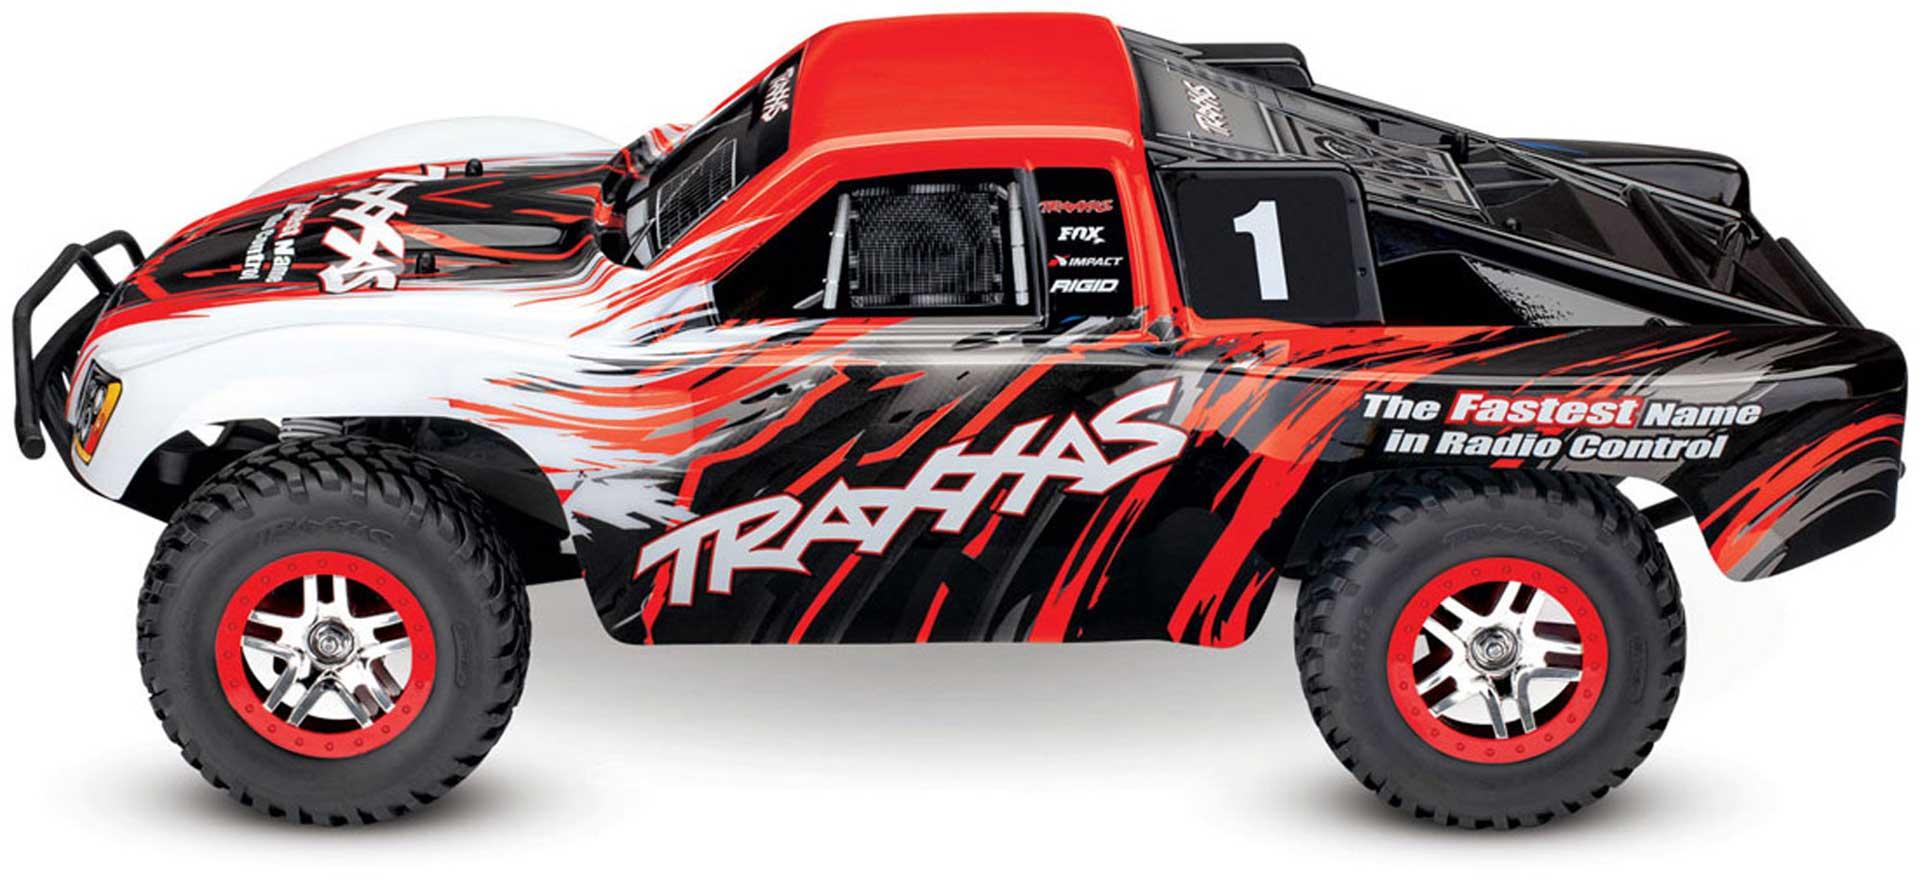 TRAXXAS SLASH 4X4 VXL RED RTR RTR 1/10 BRUSHLESS SHORT COURSE TRUCK